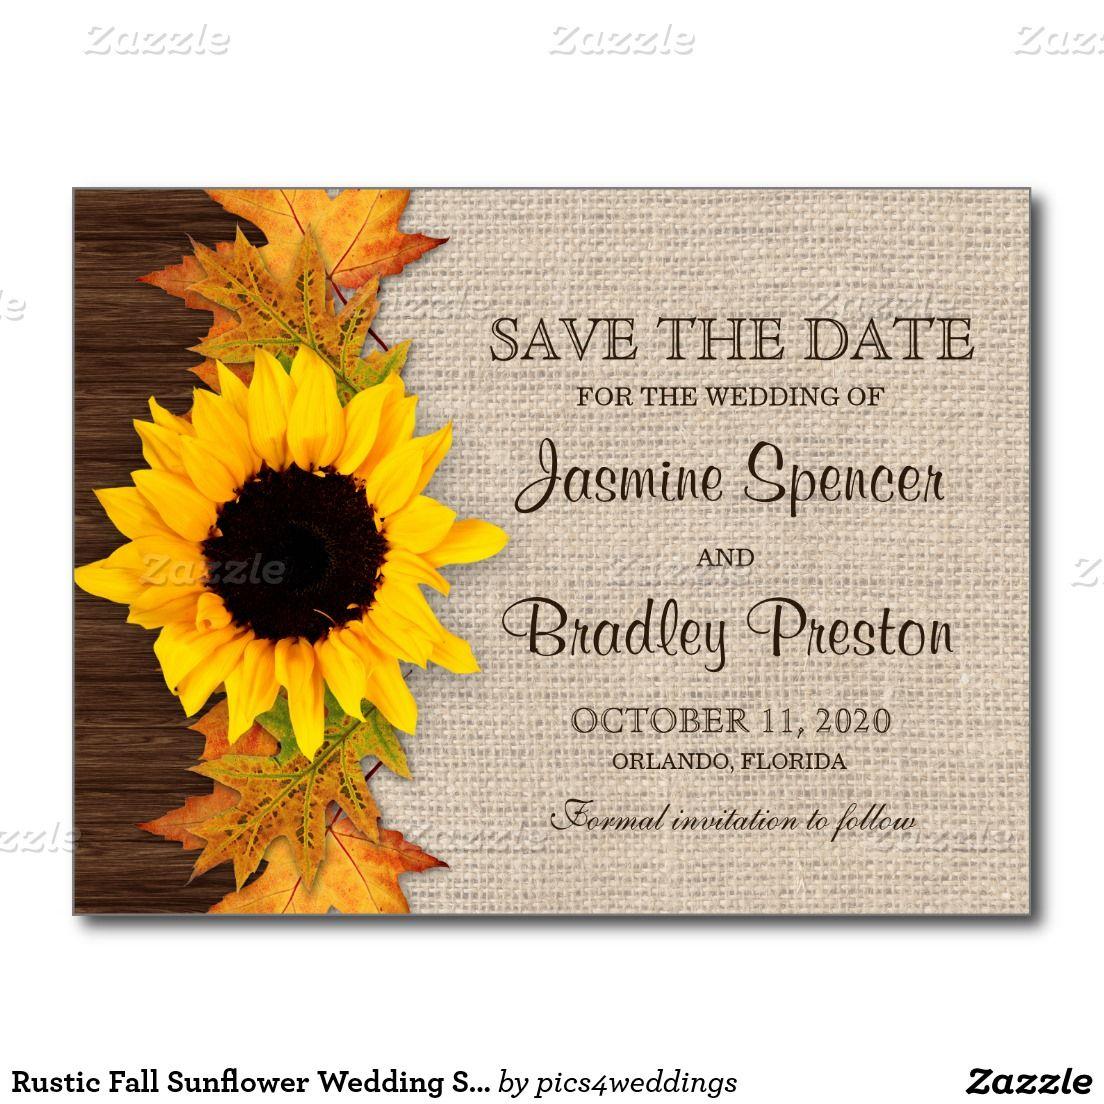 Rustic Fall Sunflower Wedding Save The Date Postcard | Sunflowers ...